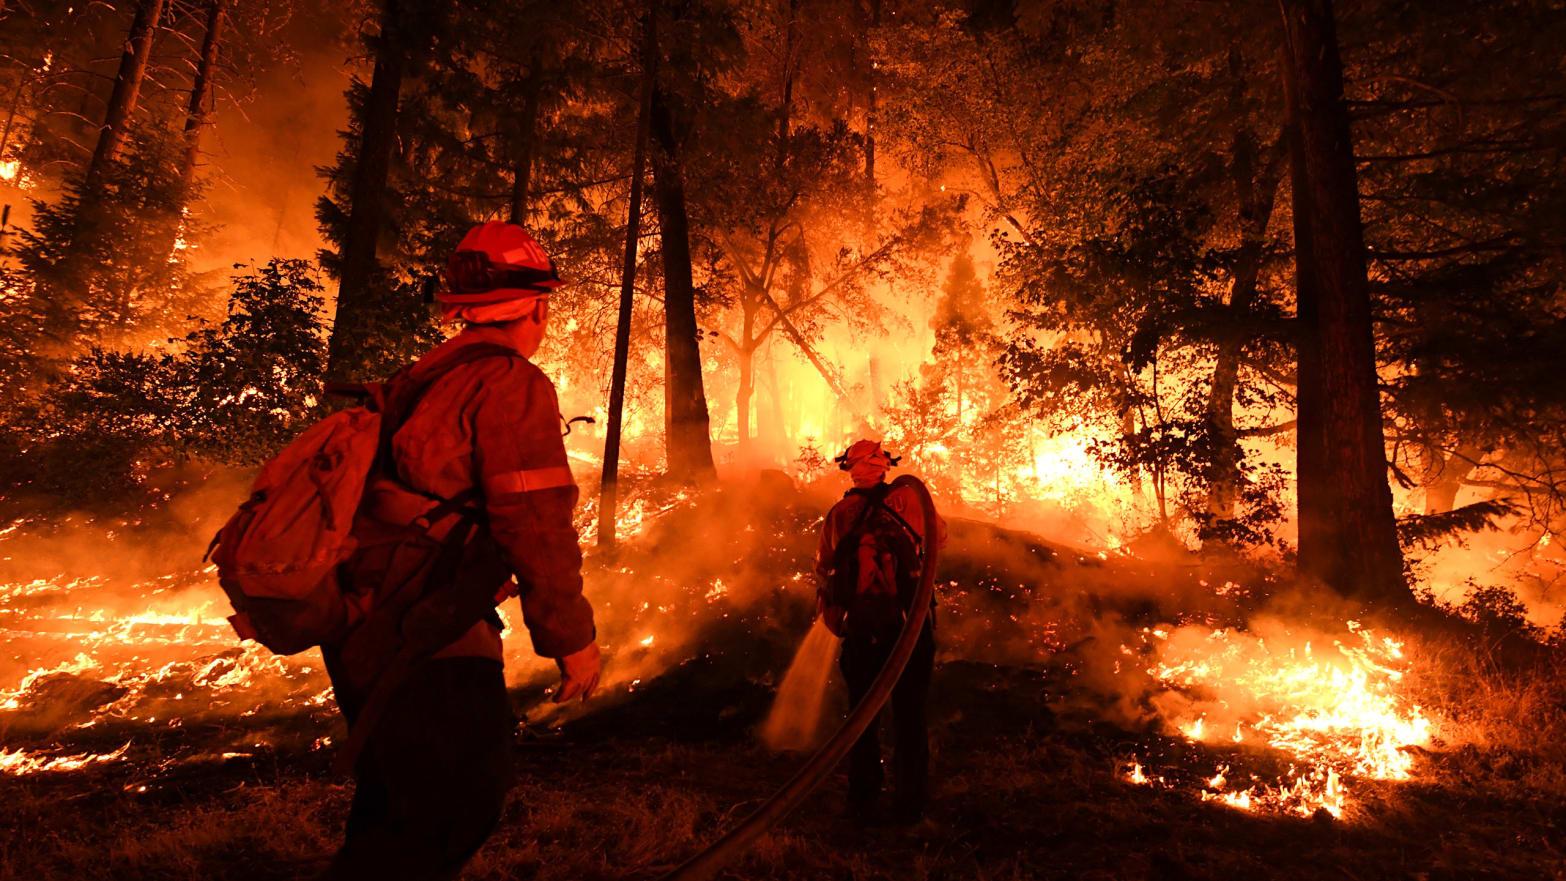 california wildfire cascades mendocino complex fire carr respiratory cardiovascular asthma emphysema breathing problems lungs hurt